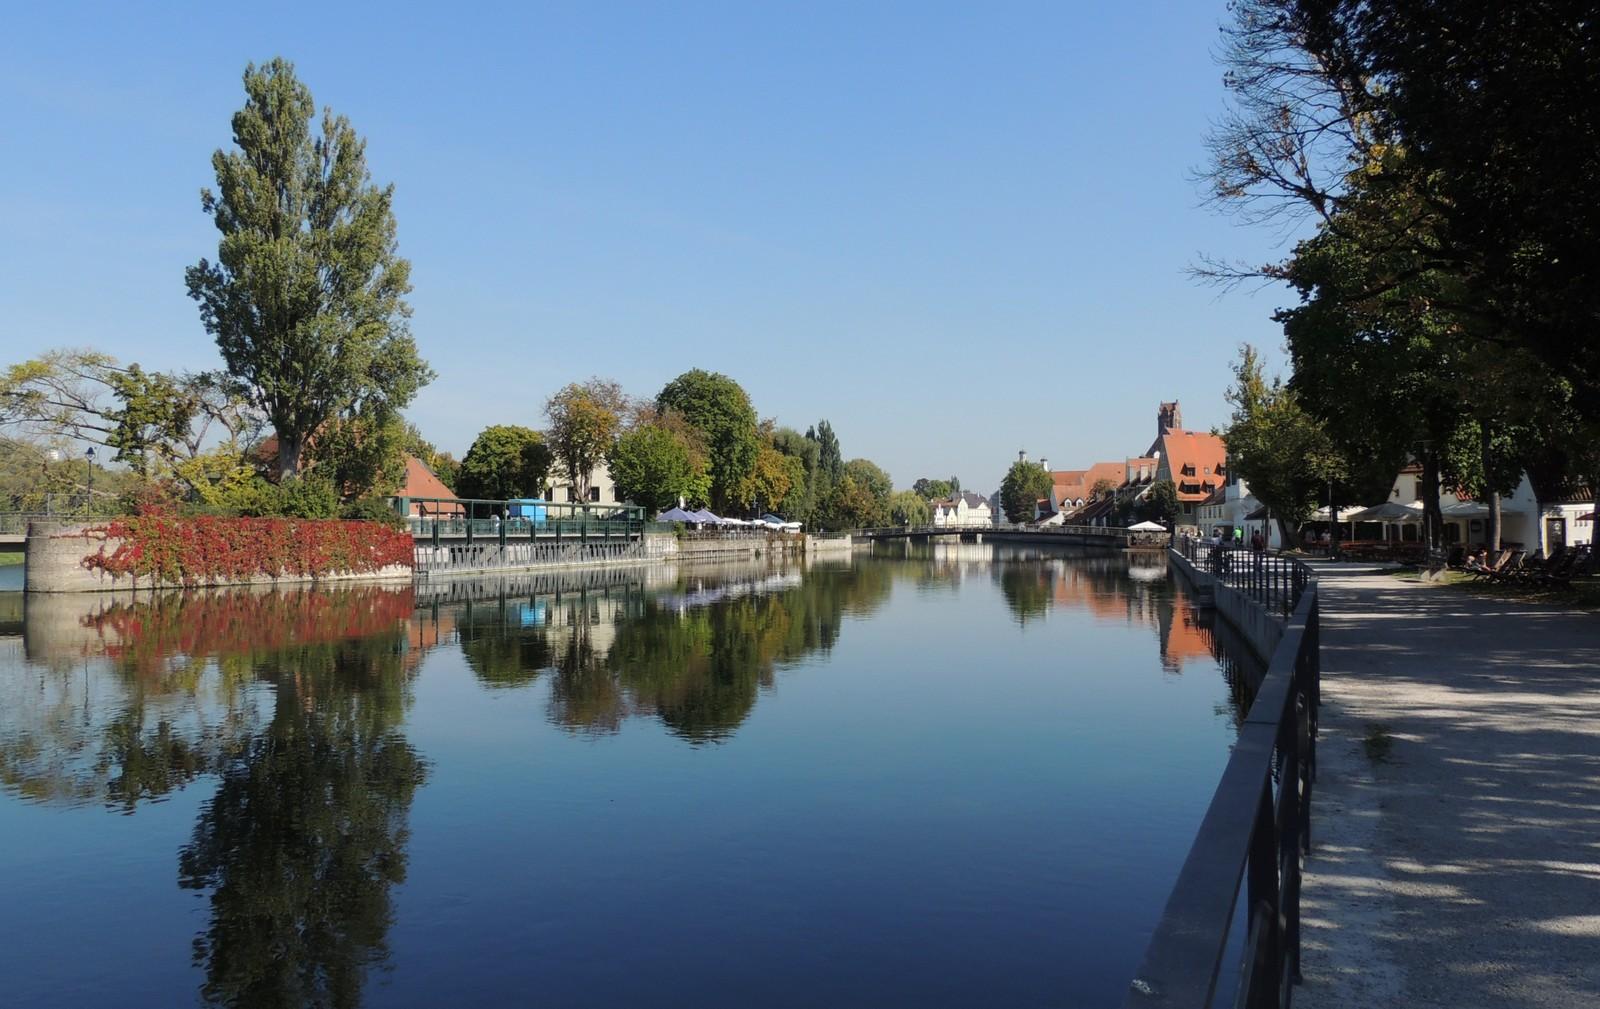 Isarpromenade in Landshut